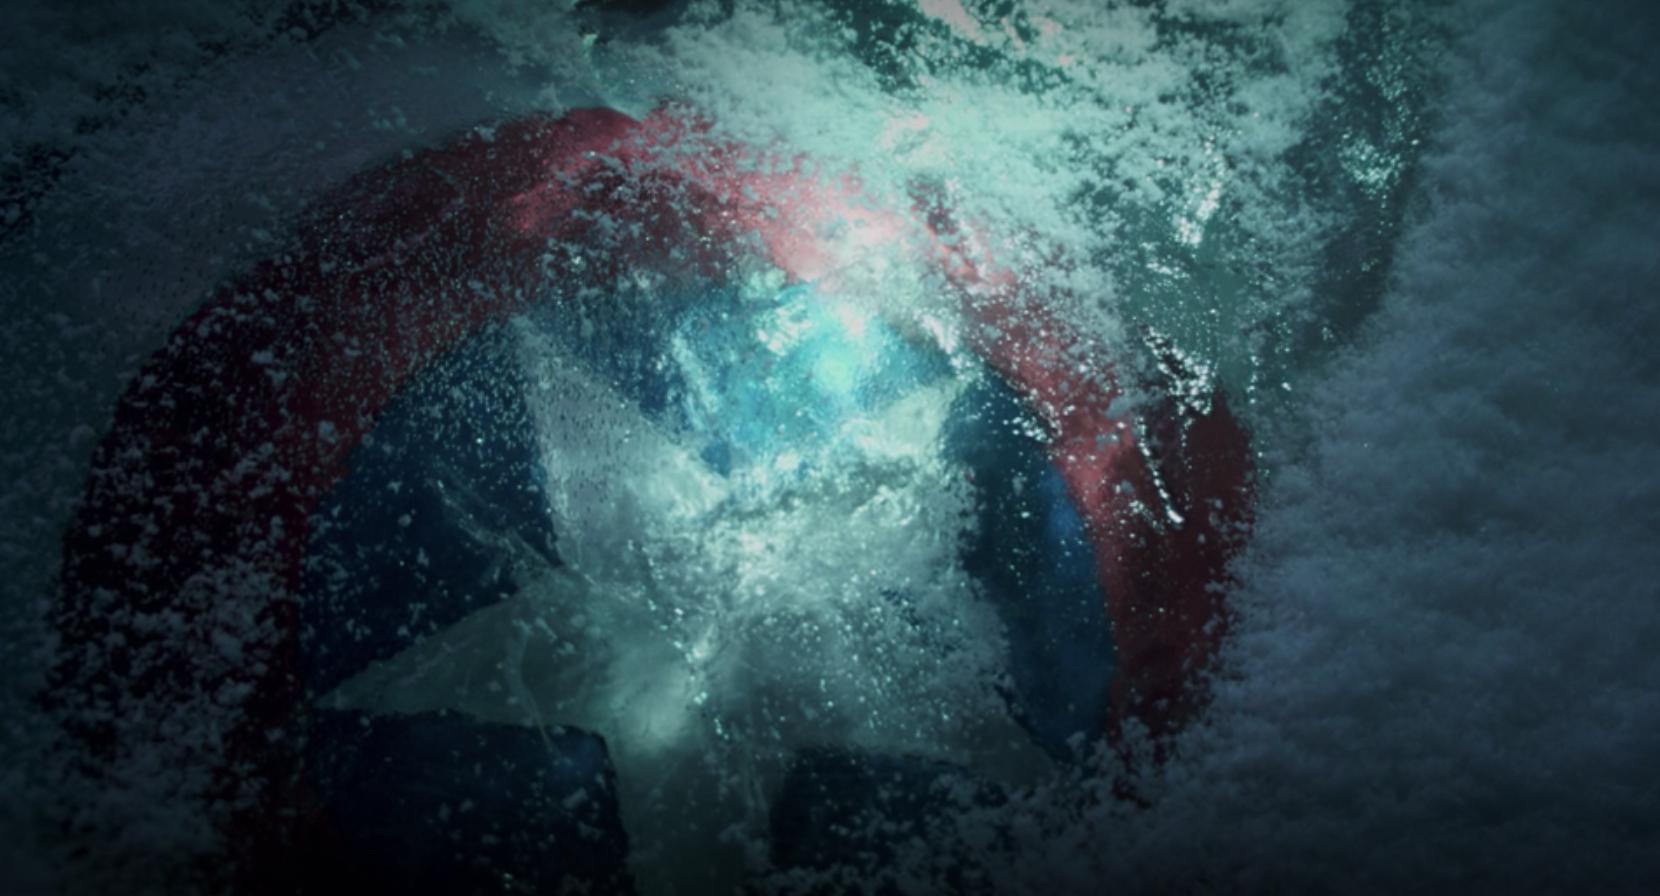 Cap's shield frozen